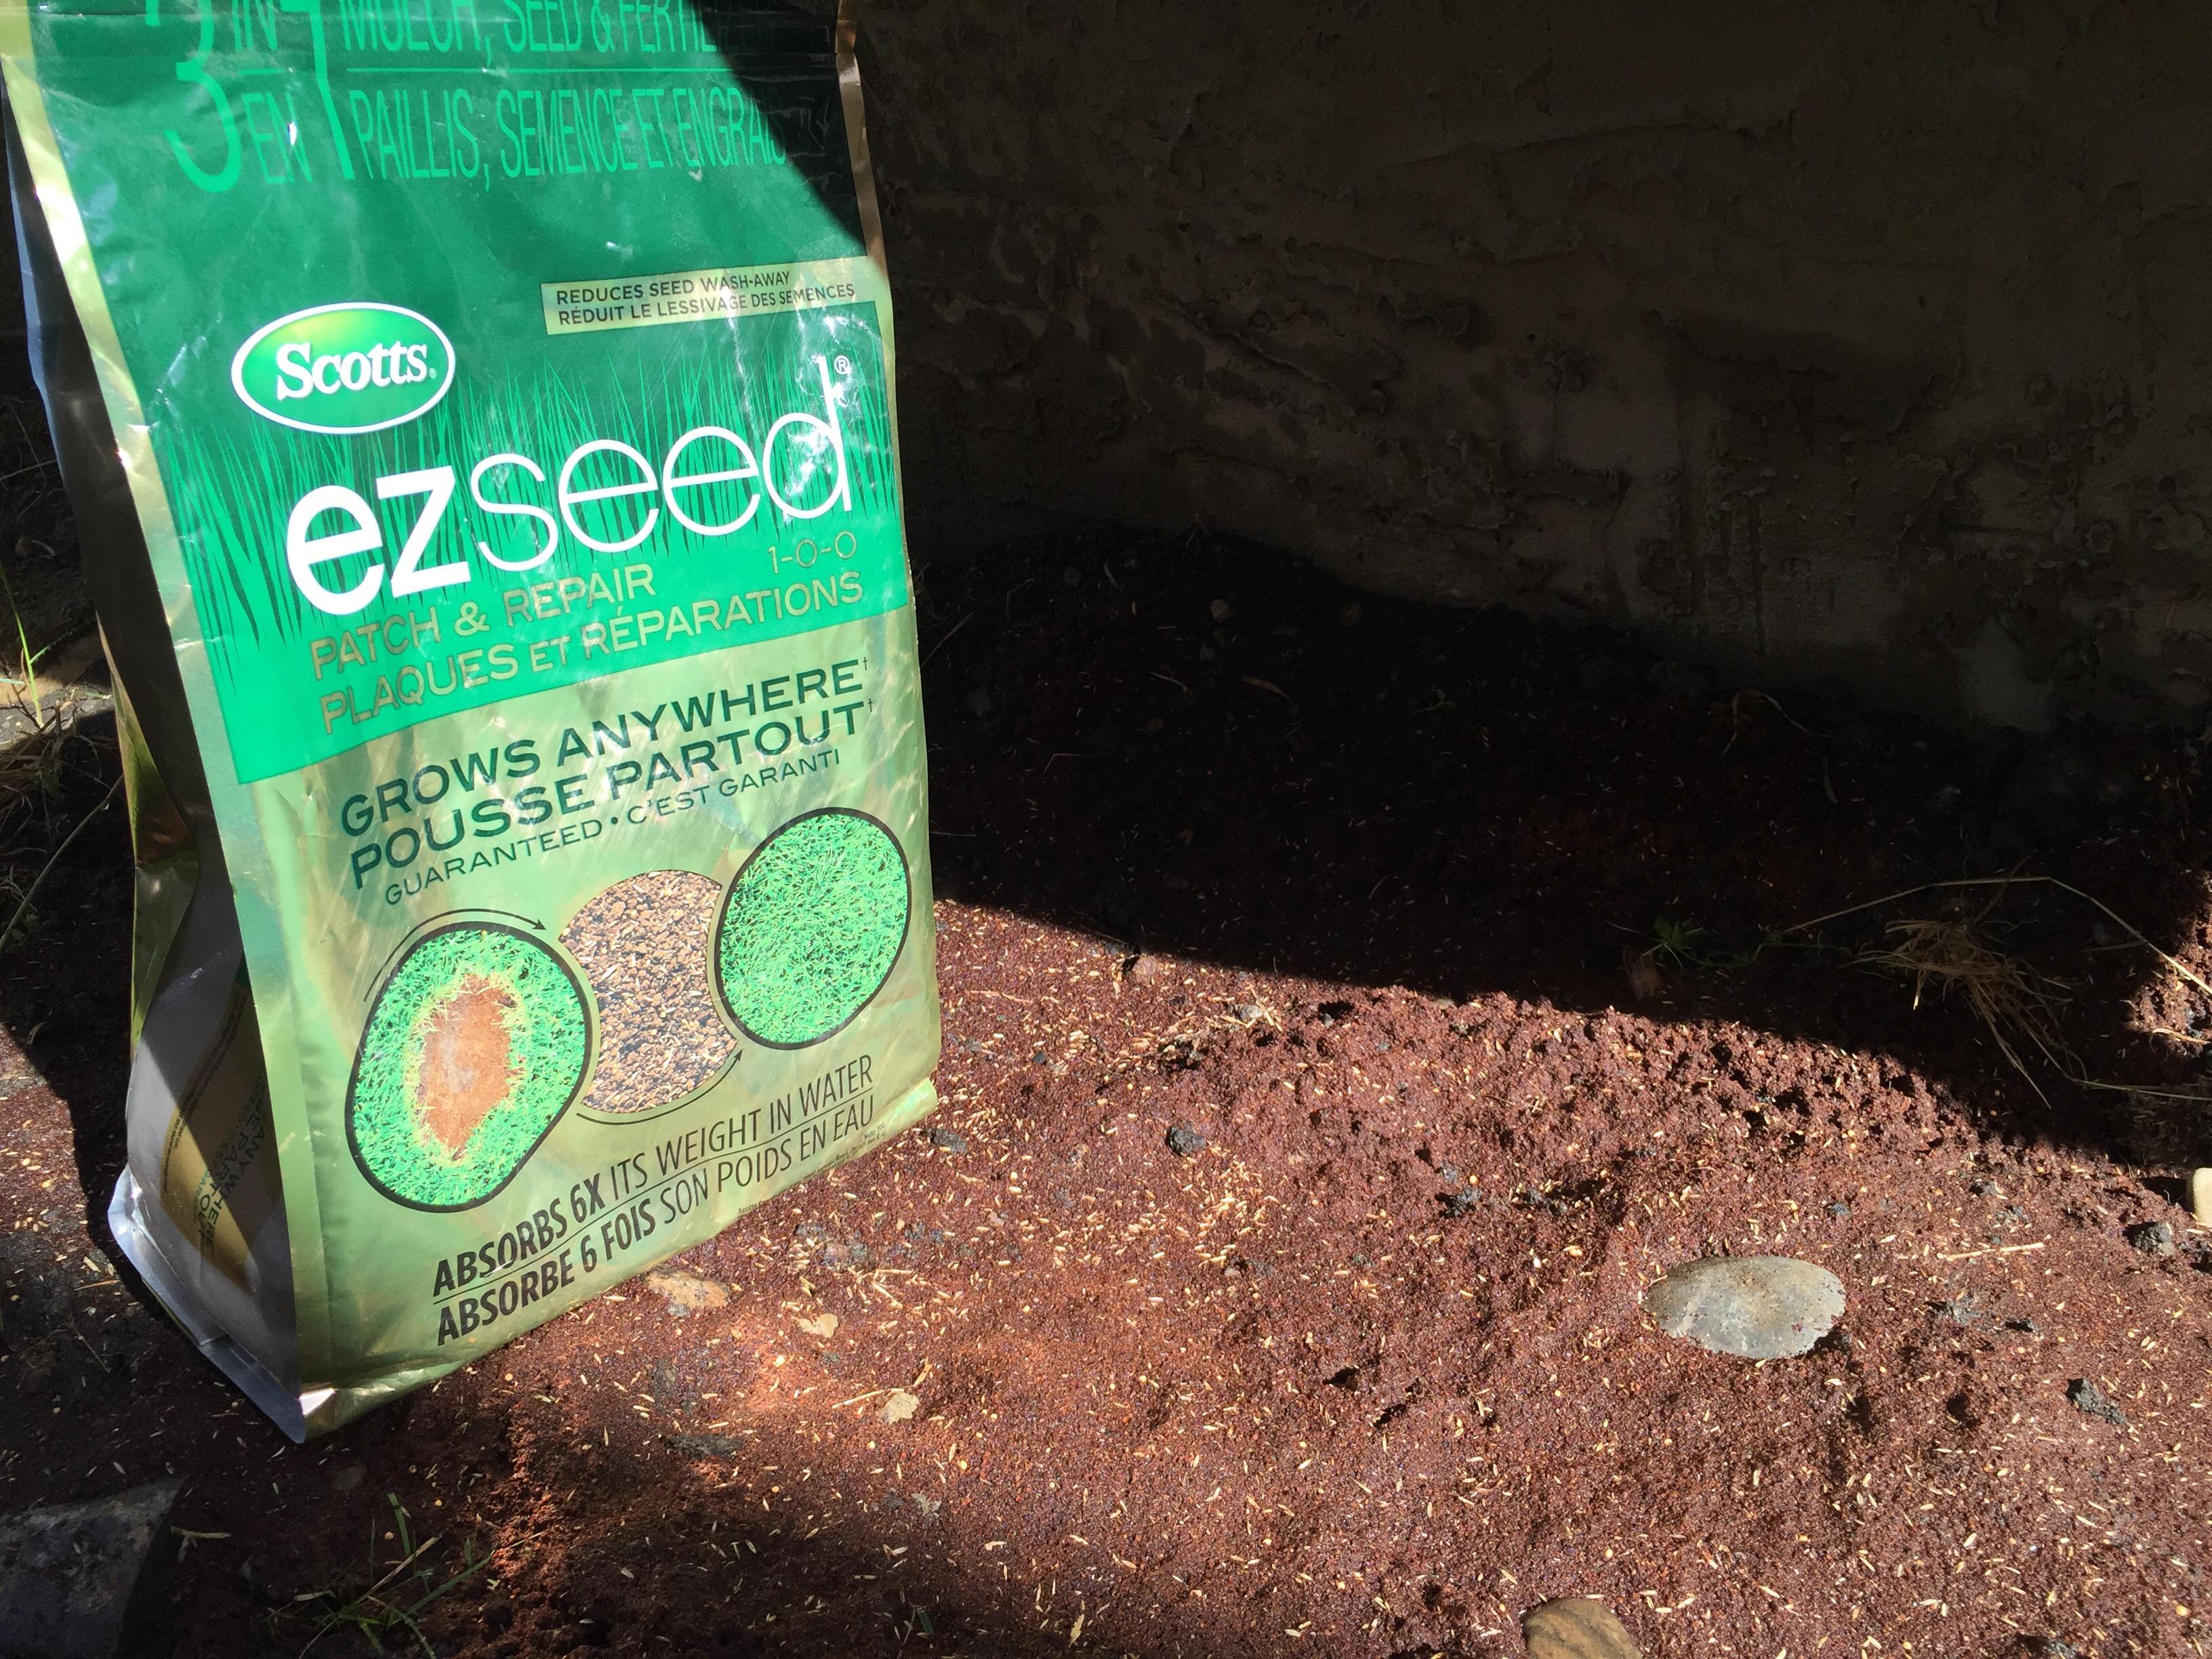 Scotts EZ Seed